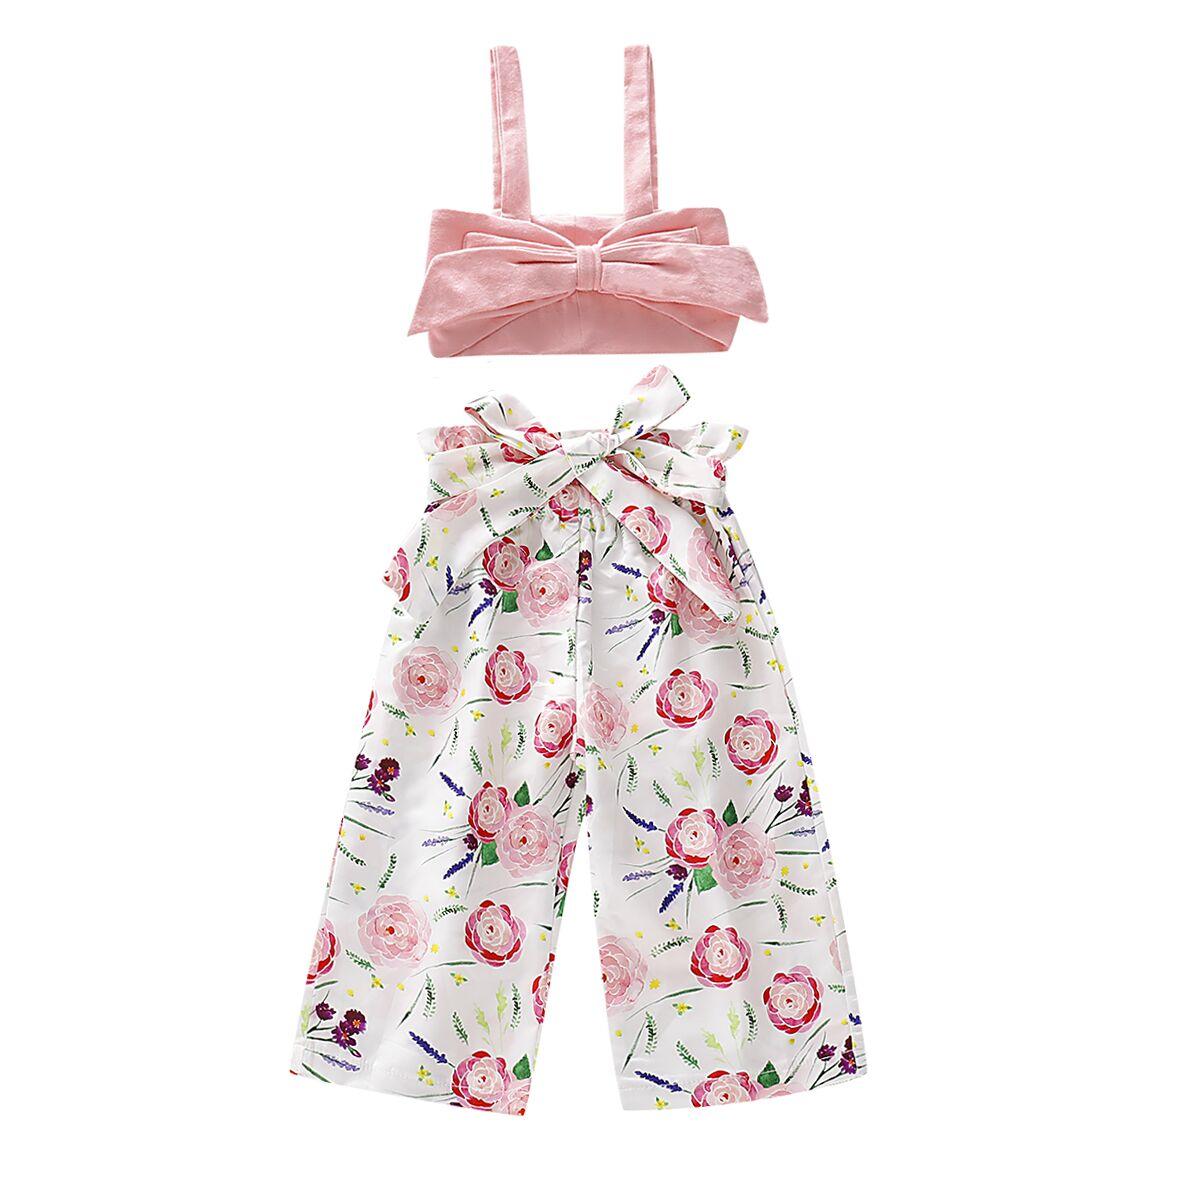 d7b0e18f 0-5Y Summer Infant Baby Girl Kids Floral Clothes Sets Sleeveless T shirt  Vest Pants Outfits Clothes 2PCS ~ Super Deal June 2019